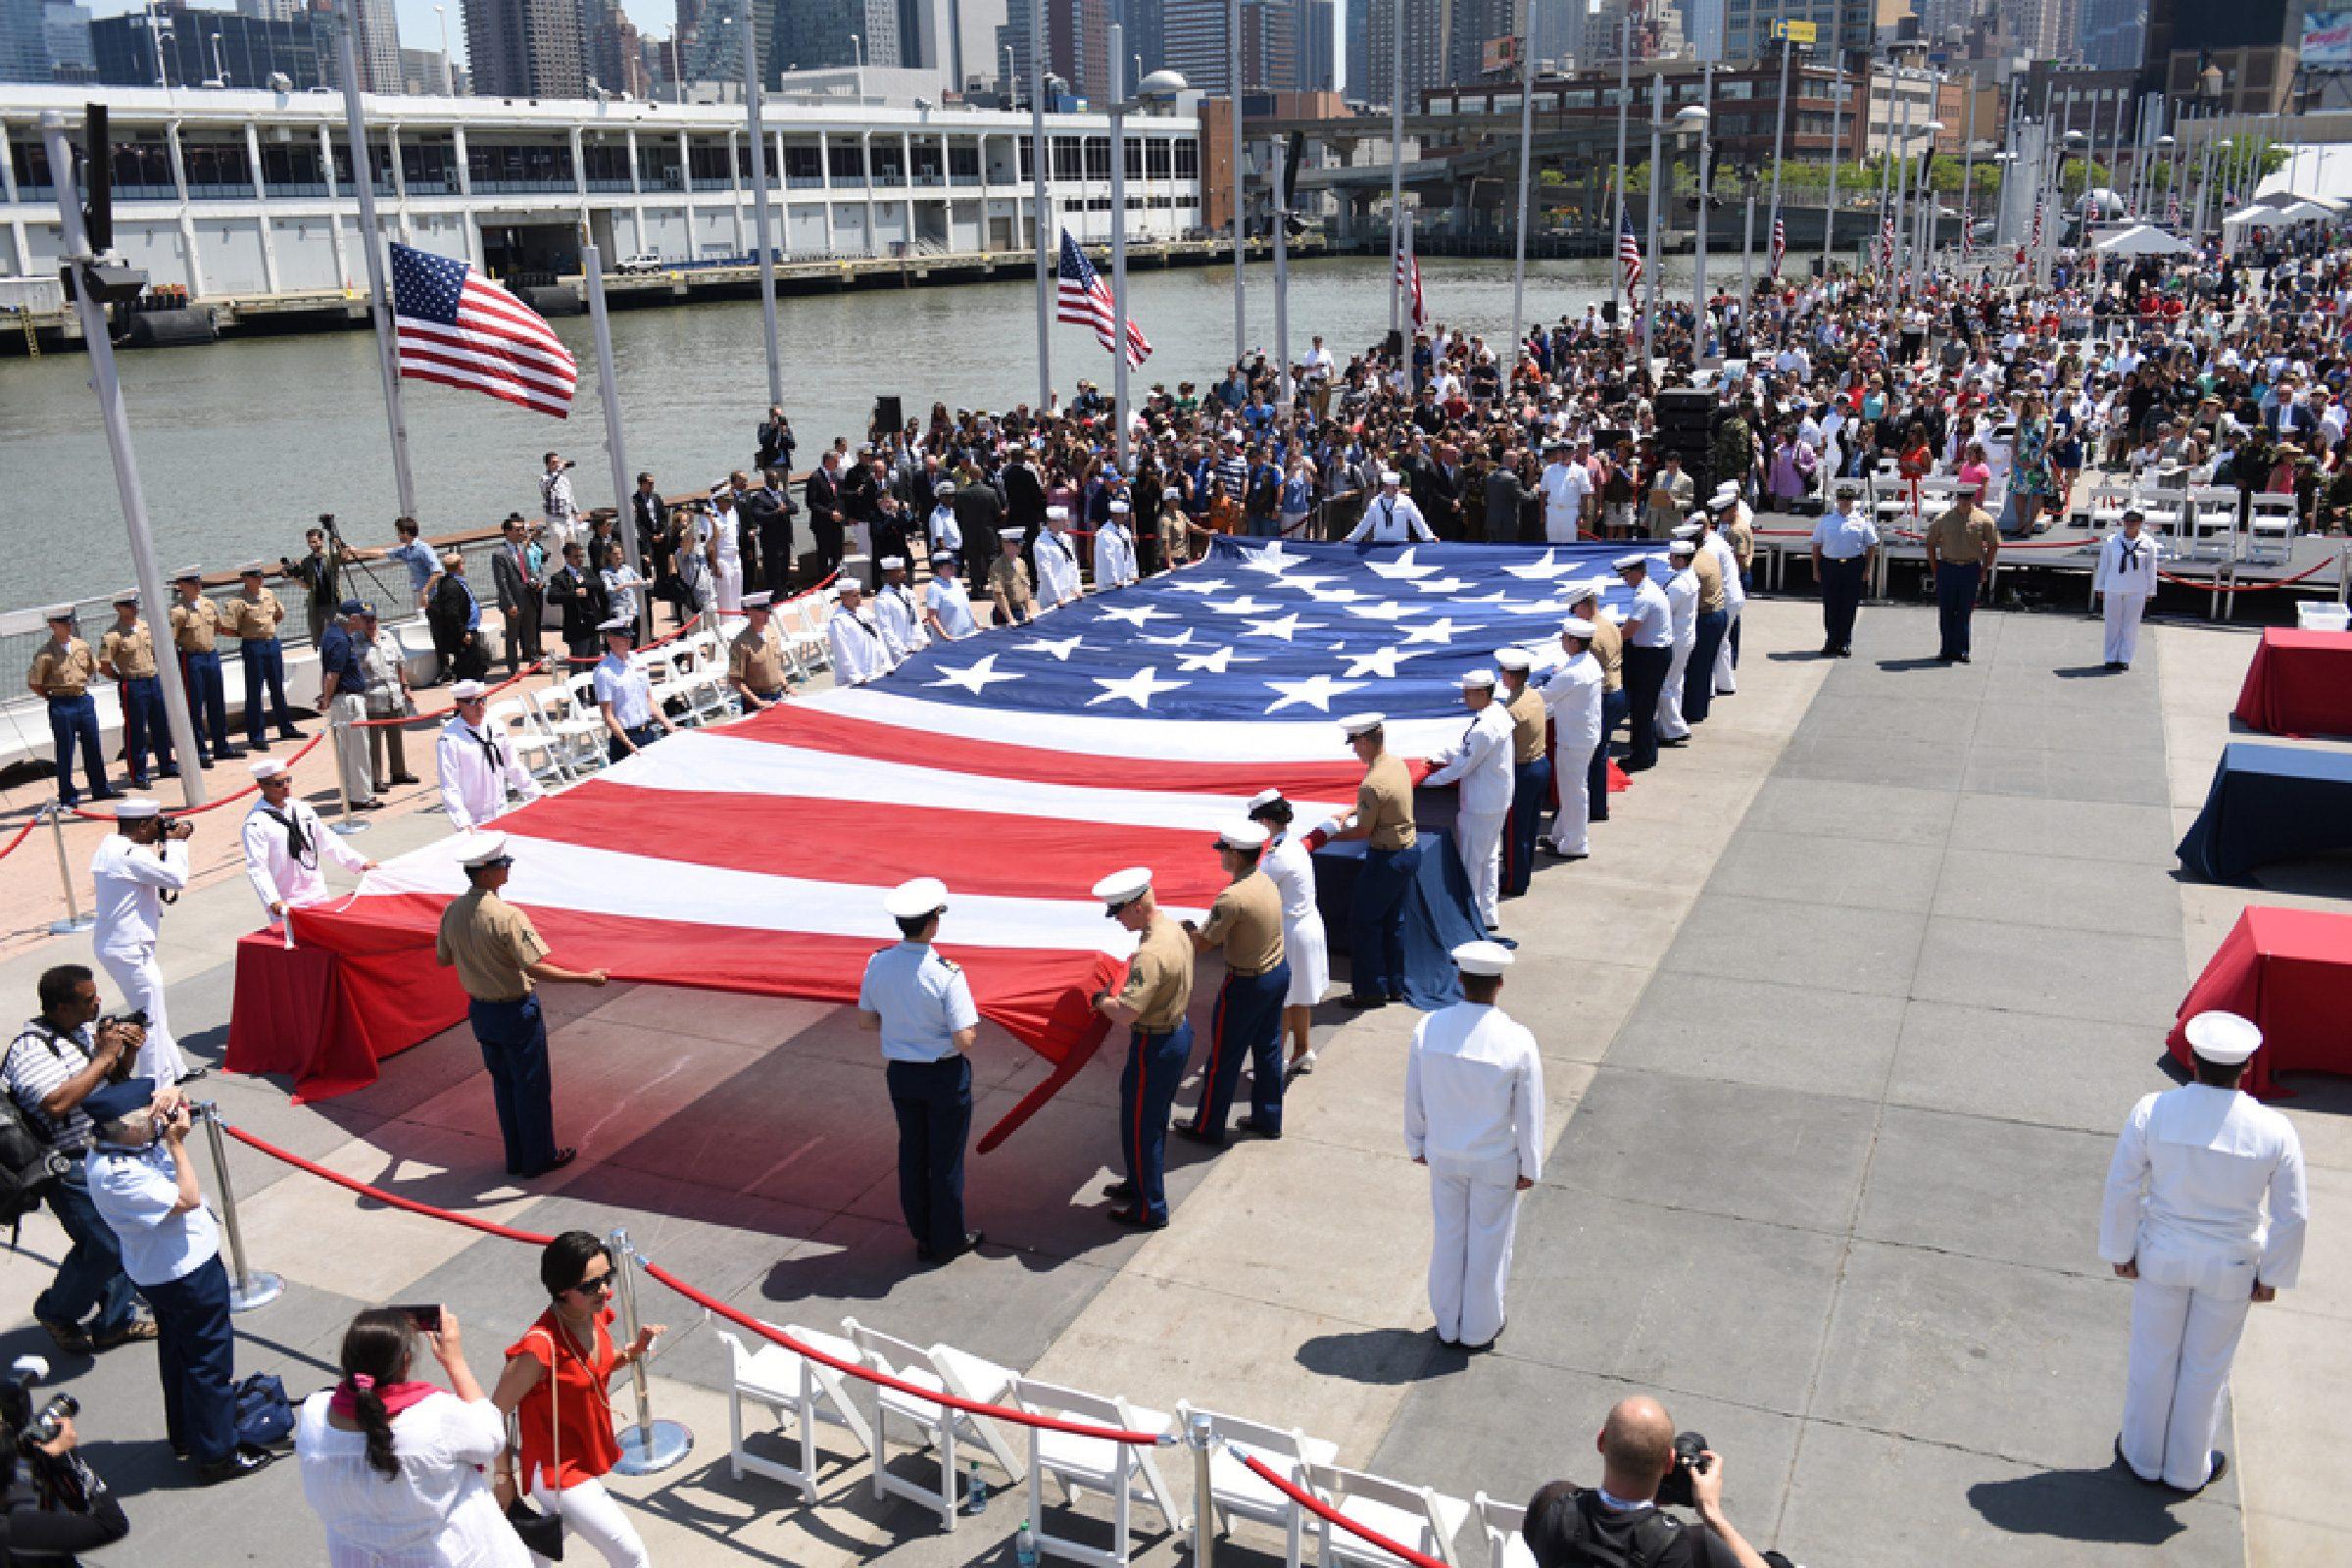 NEW YORK CITY - 25 MAY 2015: Mayor Bill de Blasio & Gen John Kelly presided over Memorial Day observances on Pier 86 by the USS Intrepid. Unfurling enormous US flag